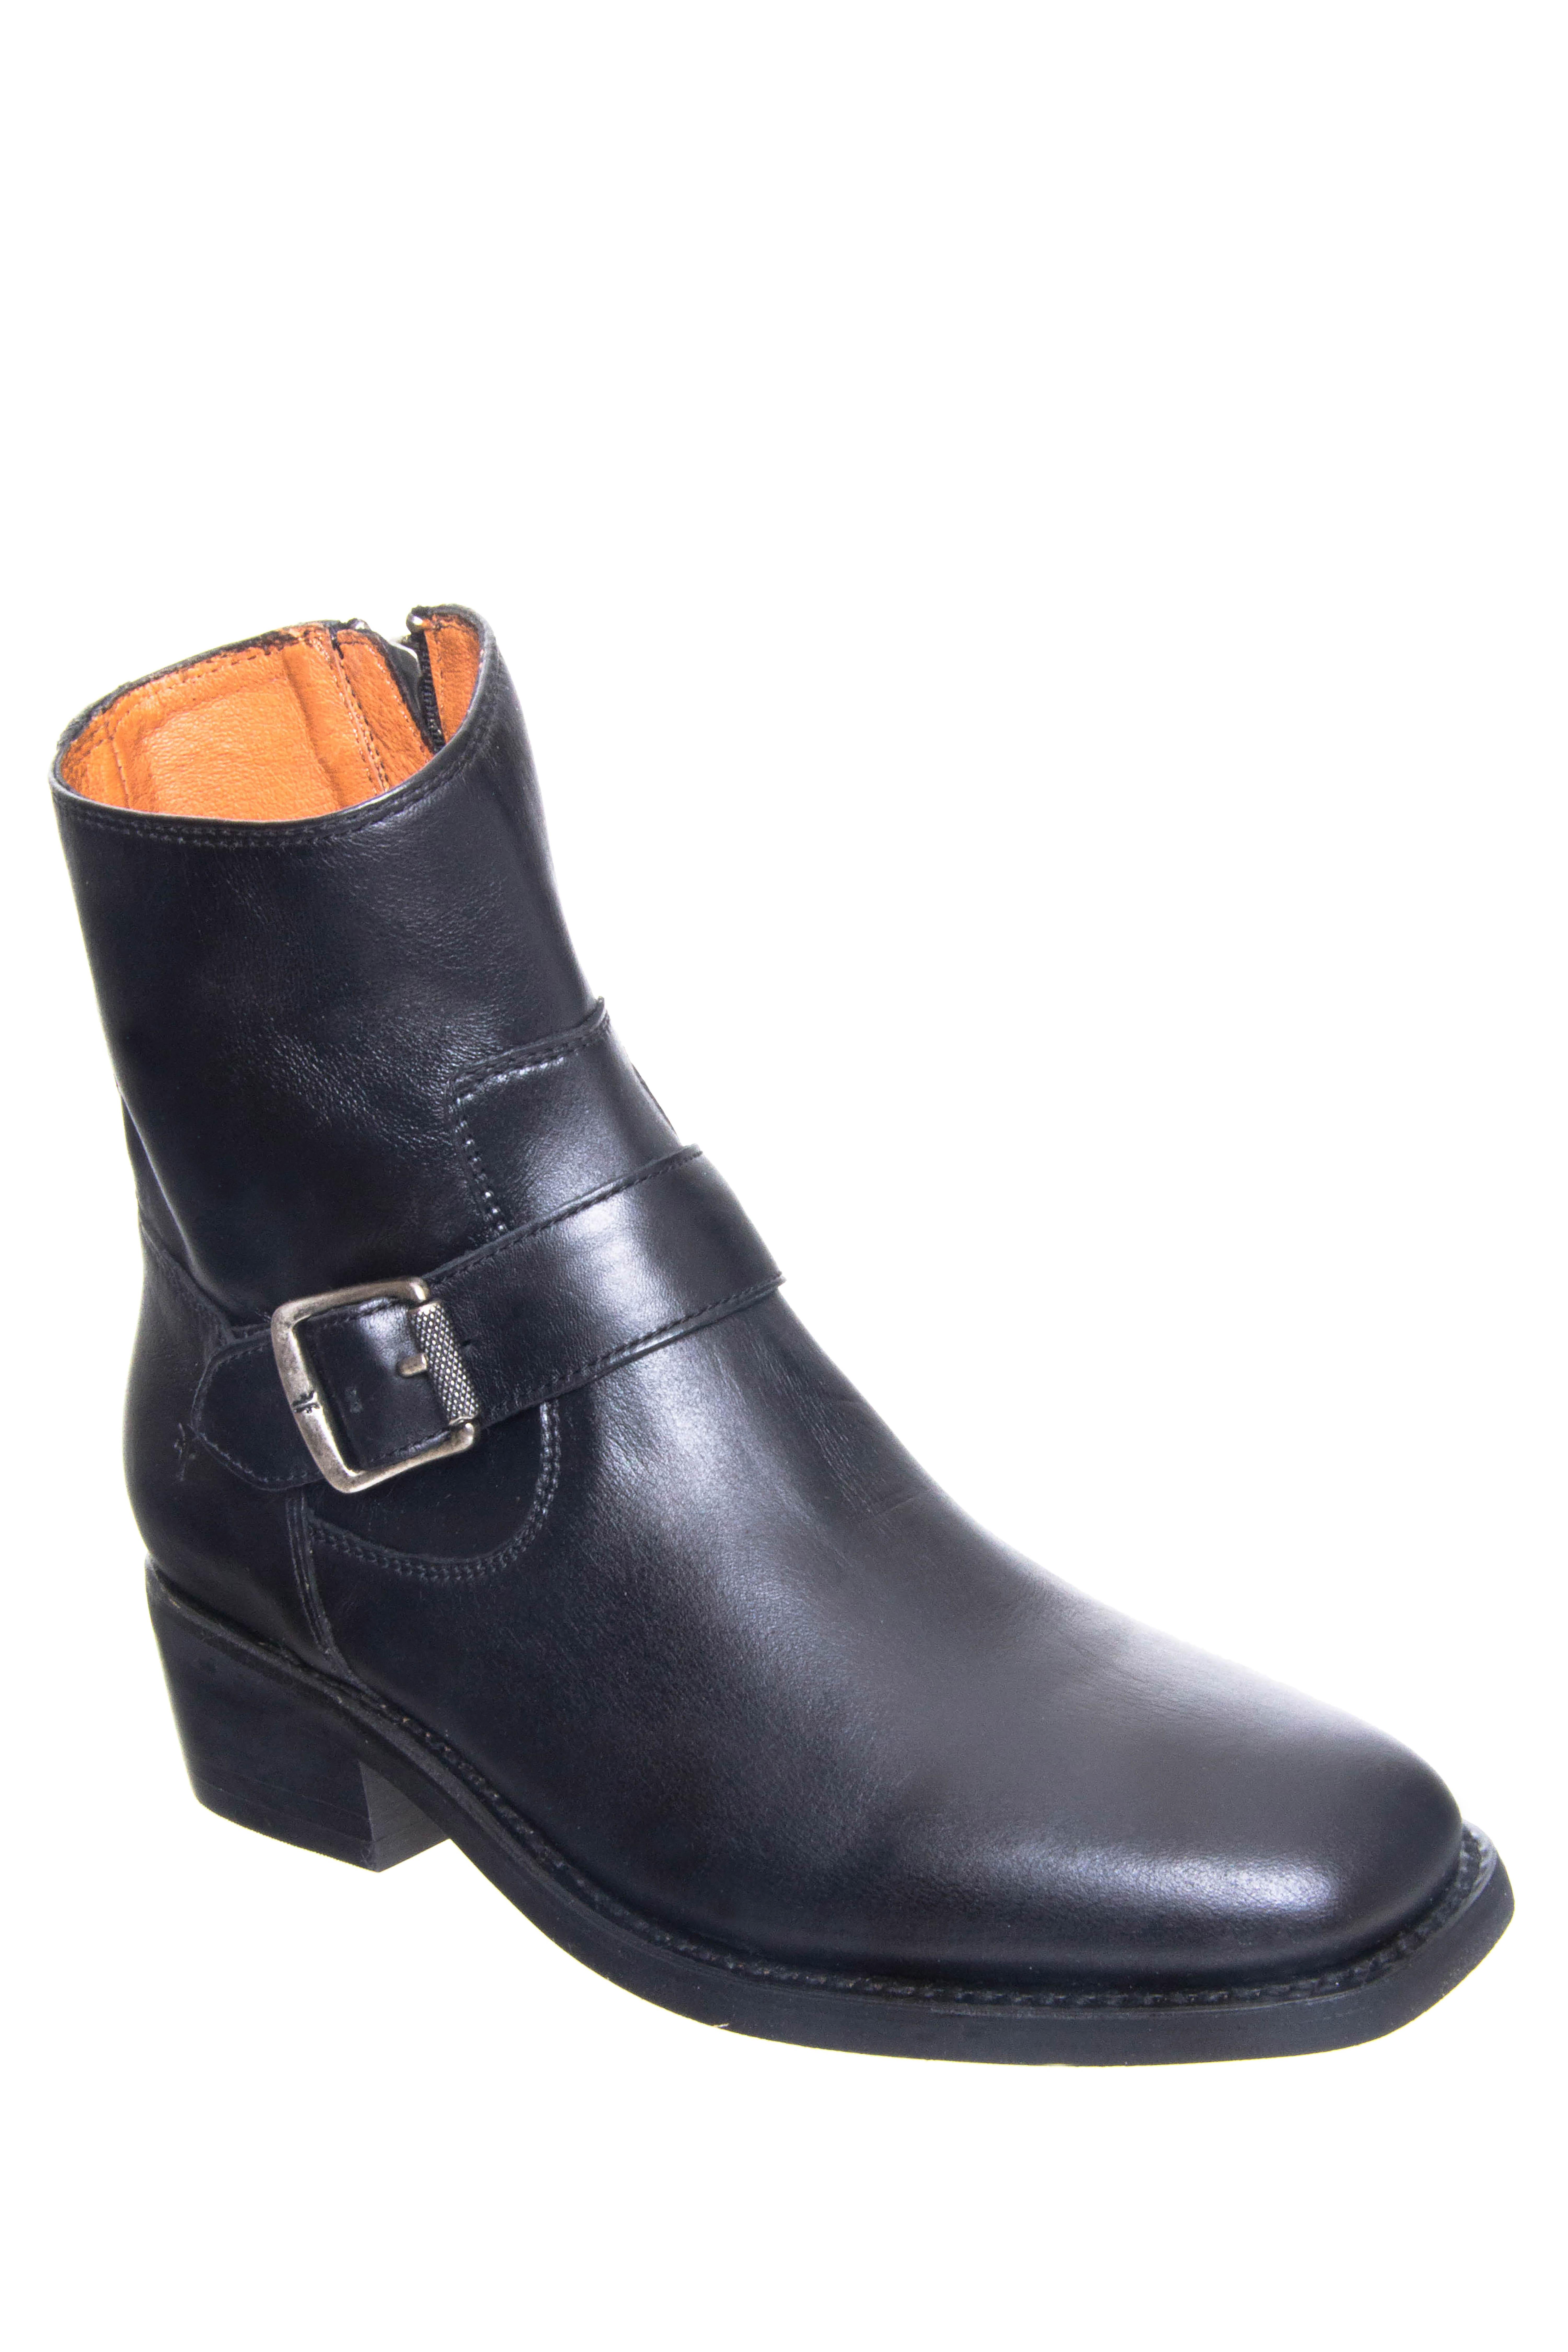 Frye Hannah Engineer Mid Heel Boots - Black